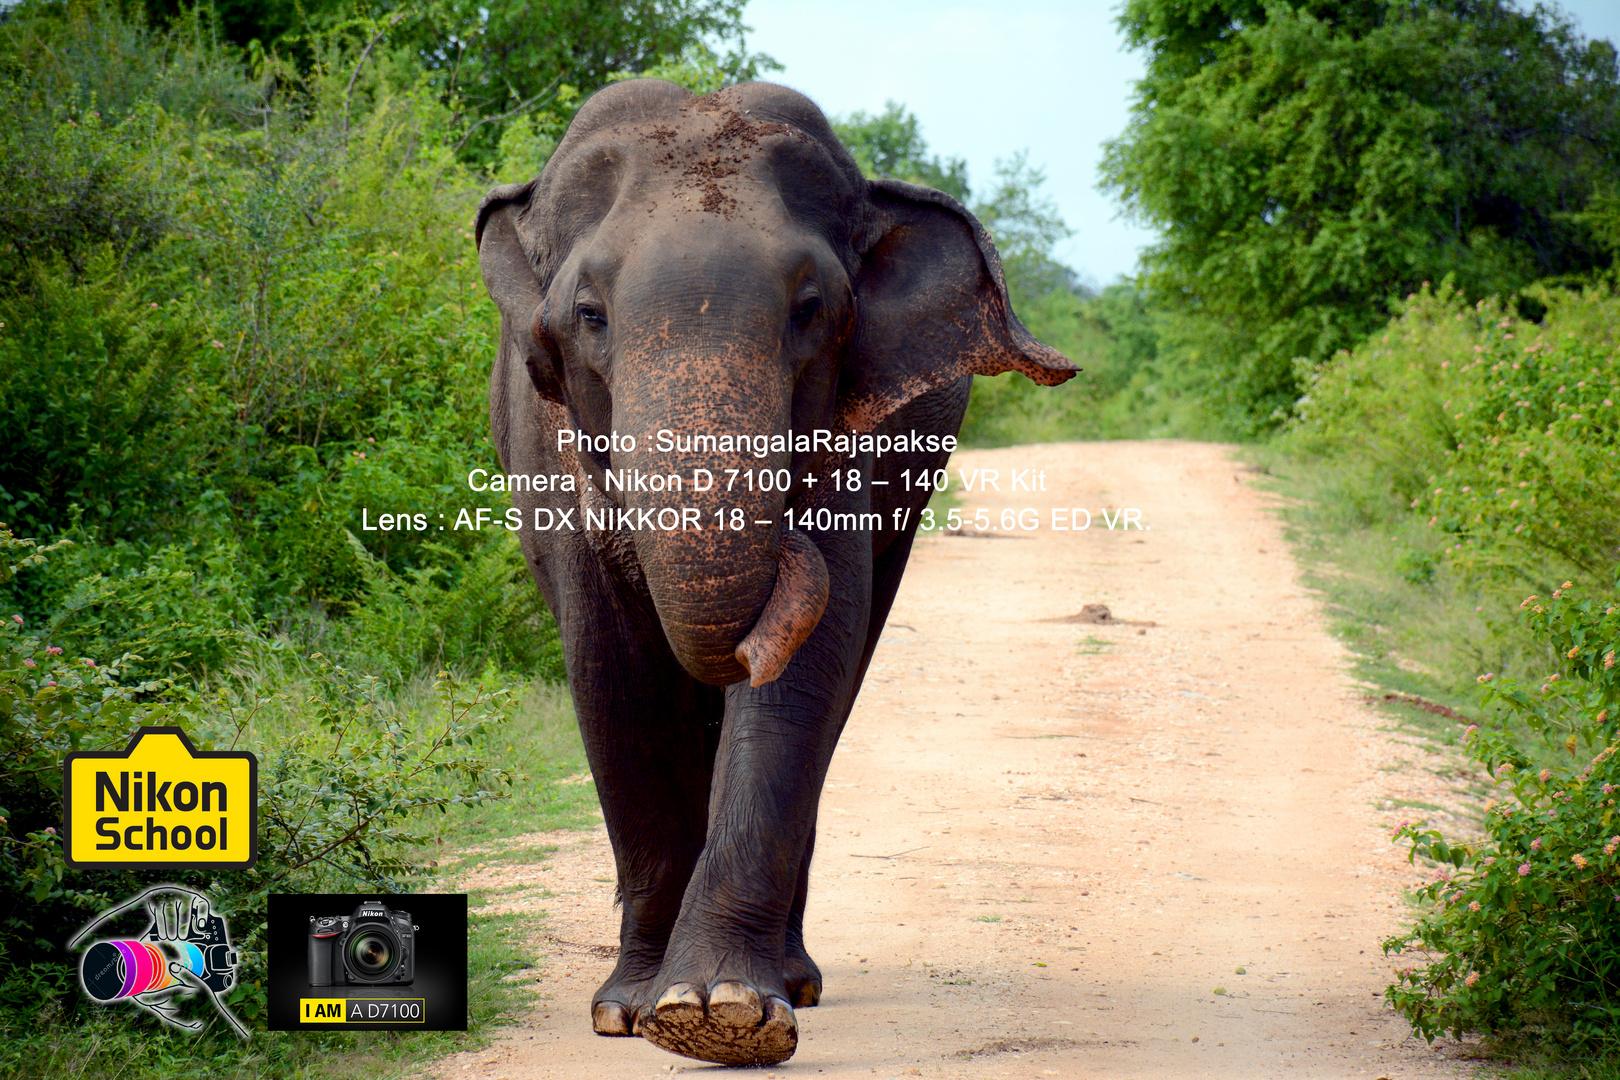 Aggressive Bull Elephant in Musth.